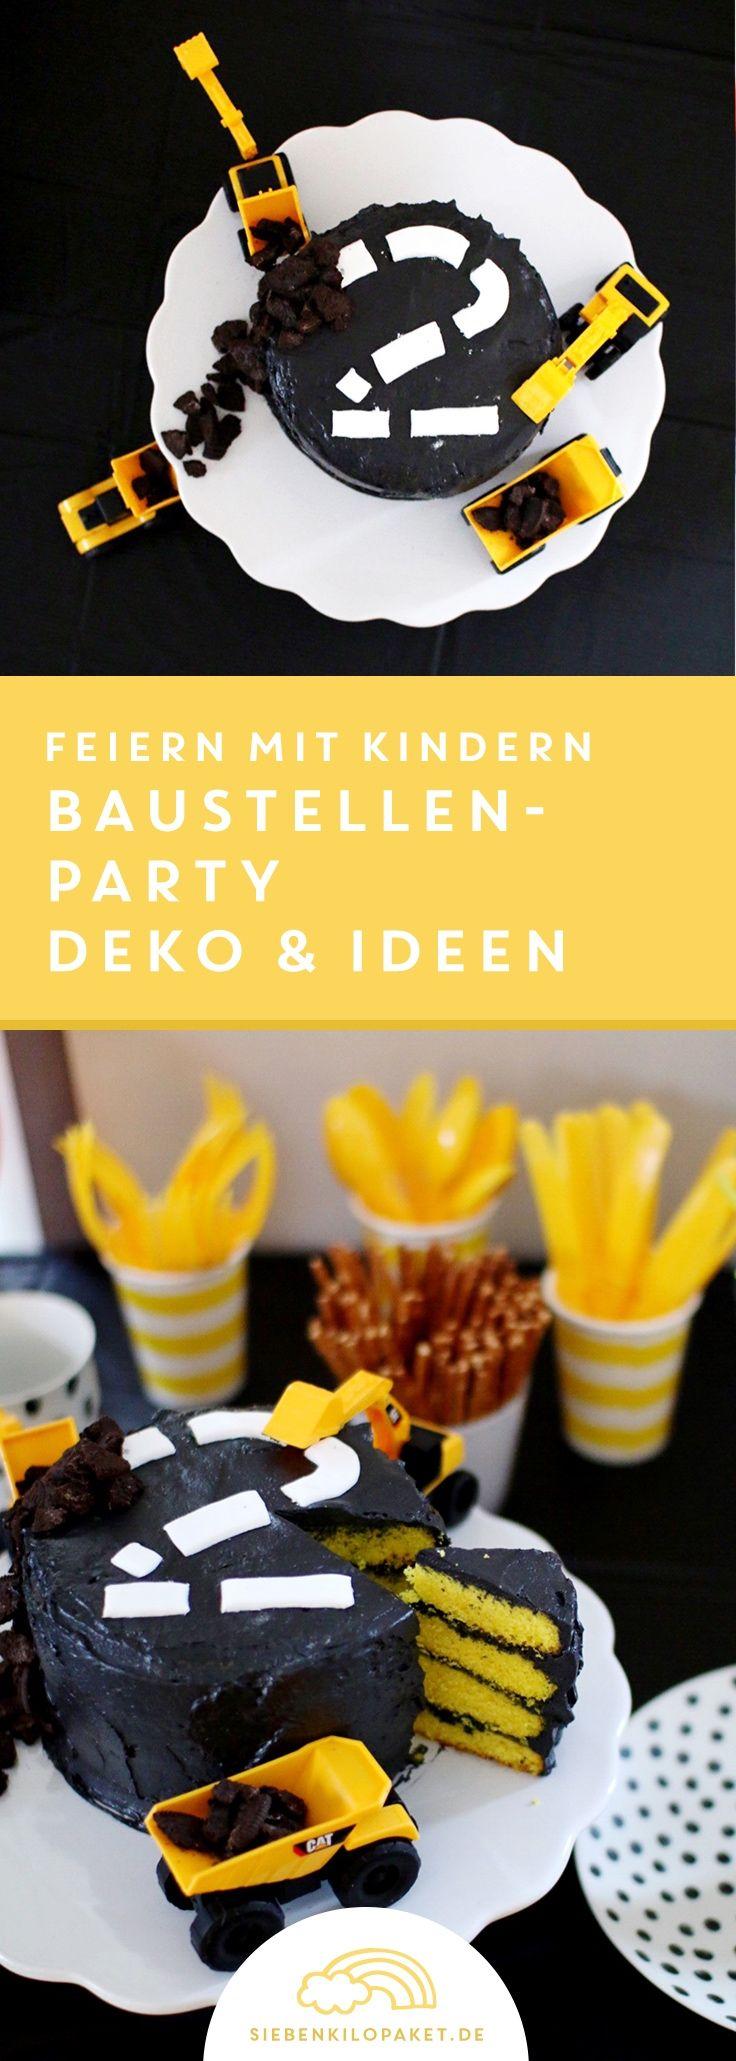 139 best images about Kindergeburtstag - Ideen | kids ...